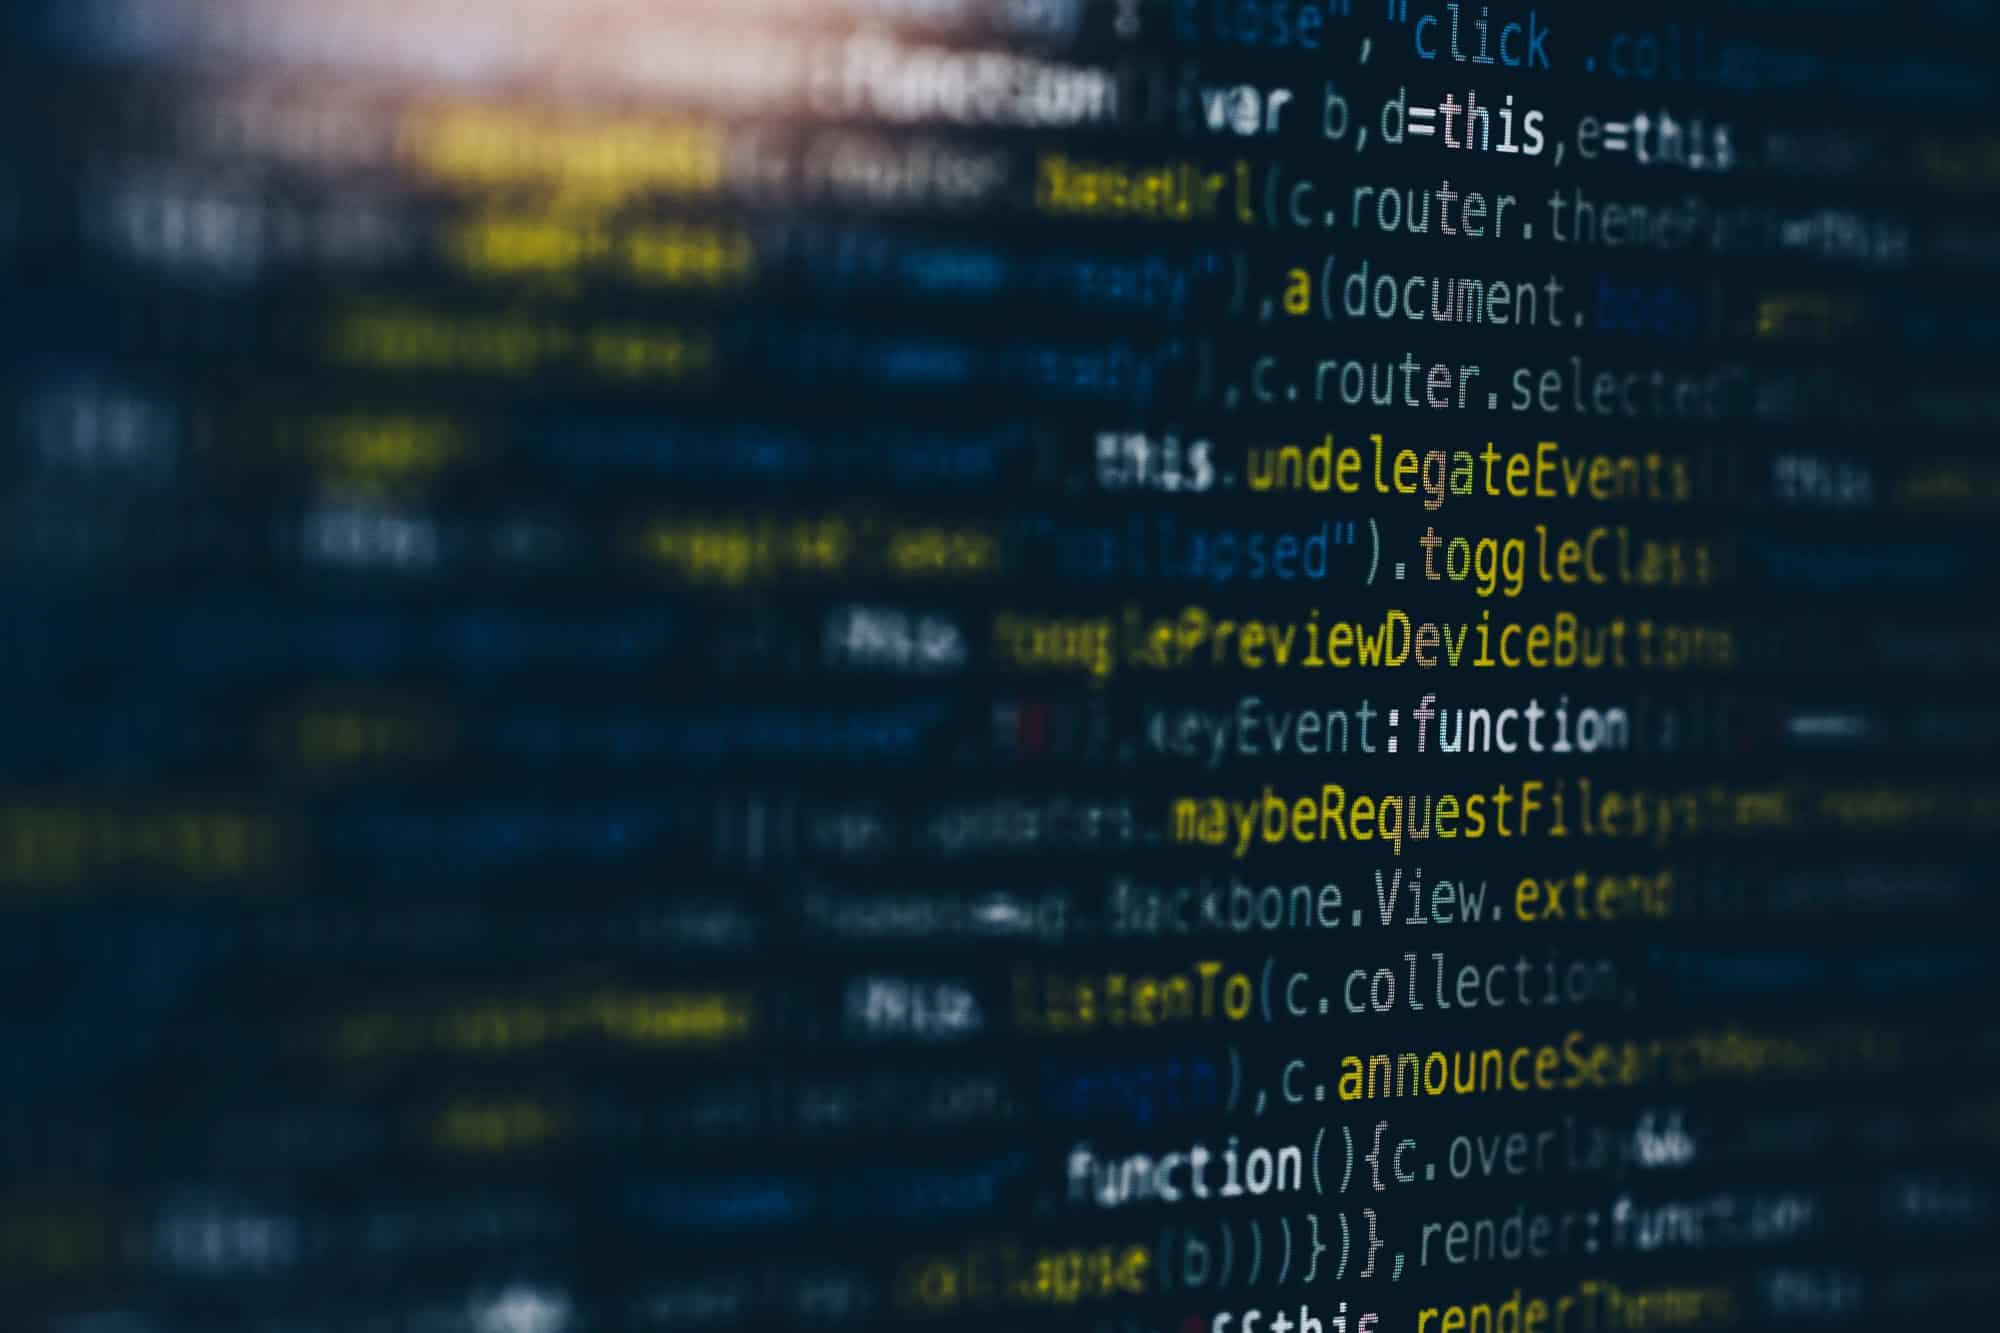 Web-based Engineering Applications